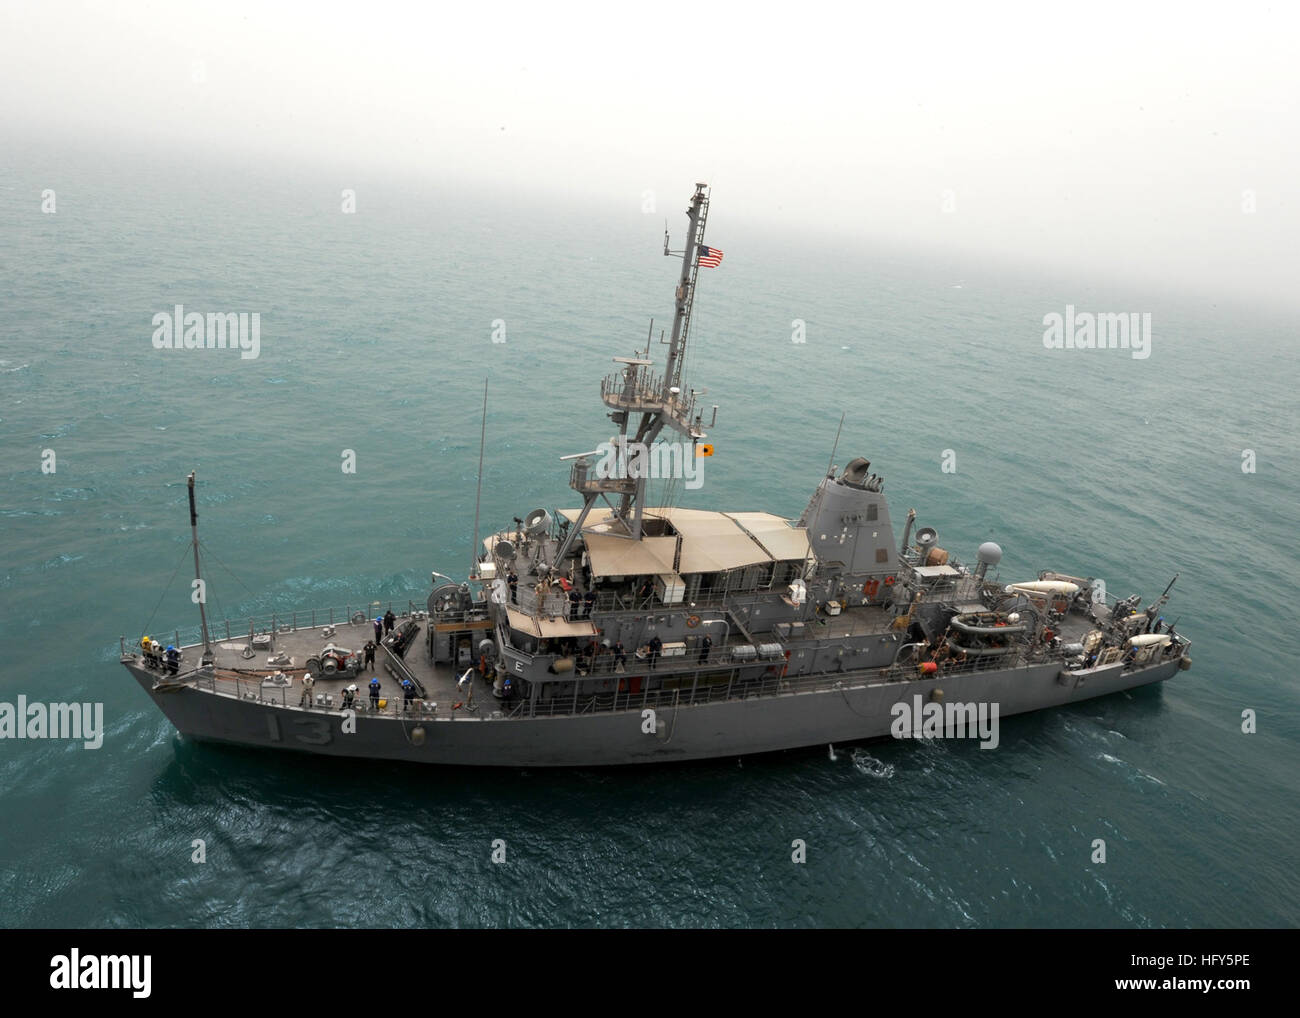 100423-N-0553R-084 ARABIAN GULF (April 23, 2010) The Avenger-class mine countermeasures ship USS Dextrous (MCM 13) - Stock Image